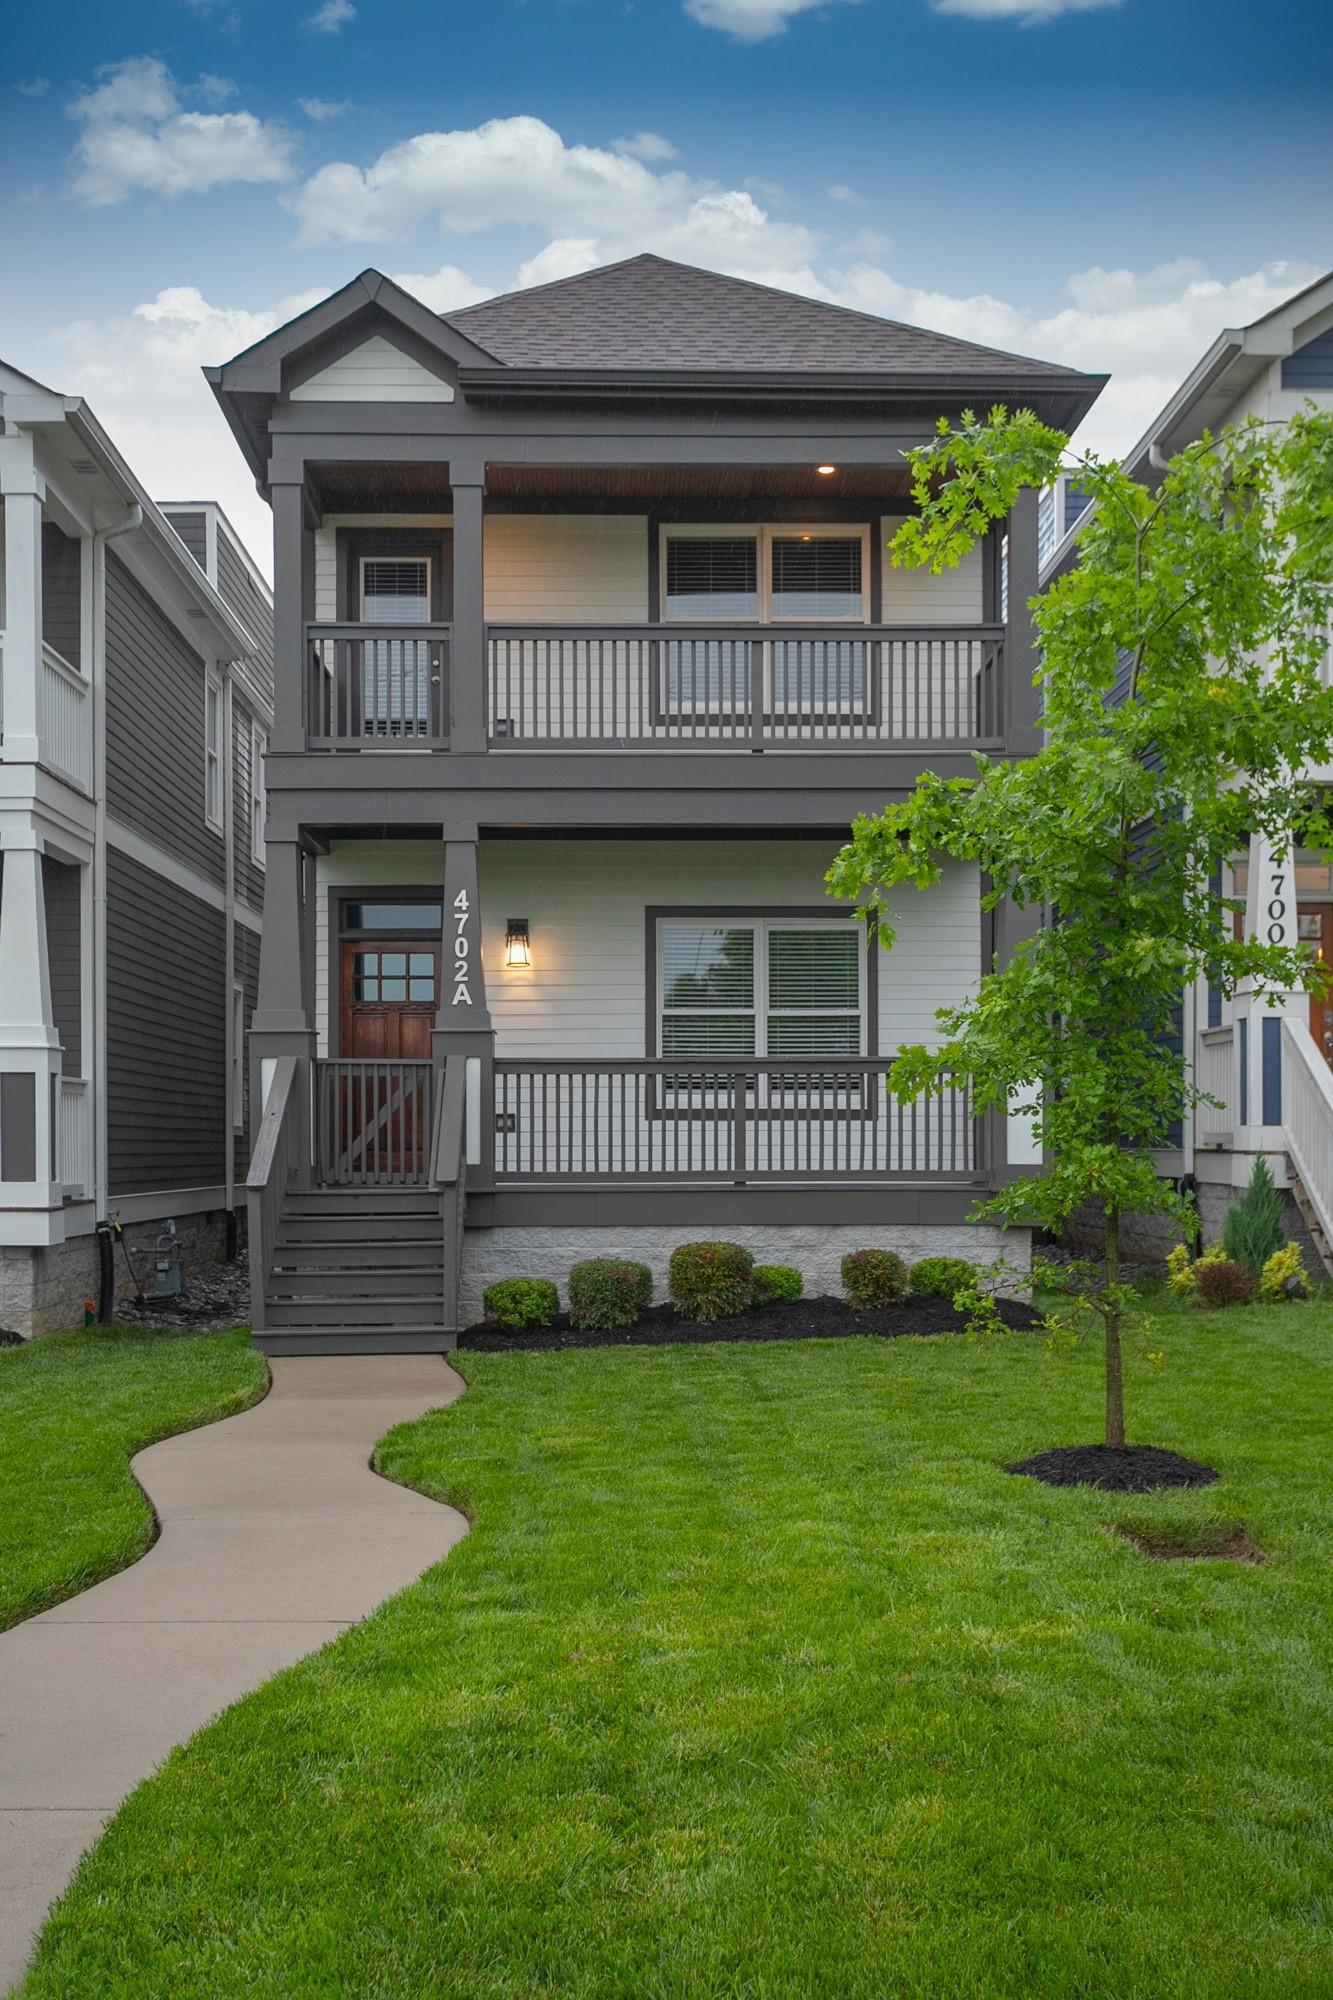 4702 Indiana Ave #A Property Photo - Nashville, TN real estate listing